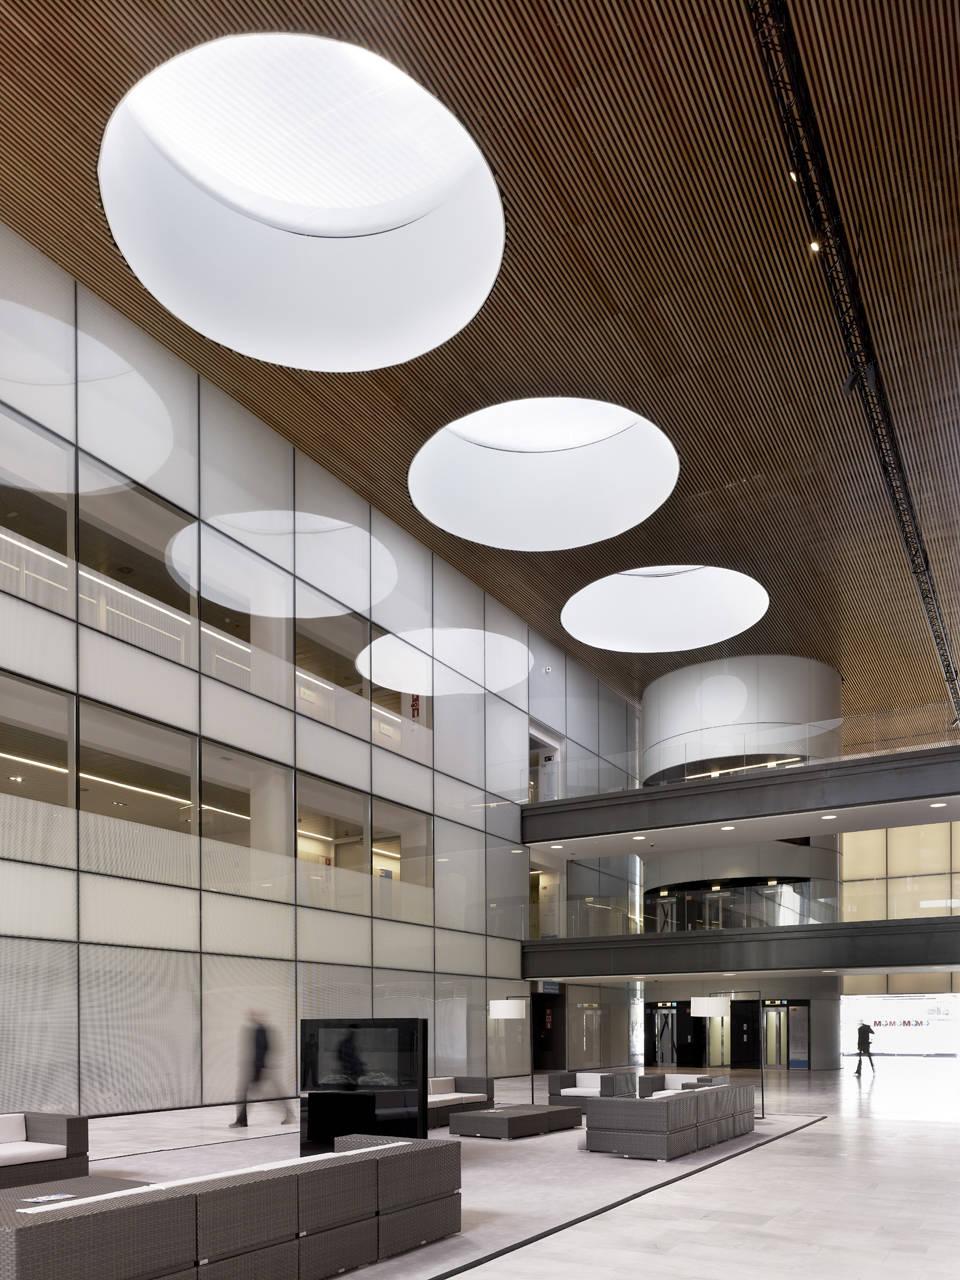 Galleria civica di trento civica pinterest - Interior design trento ...